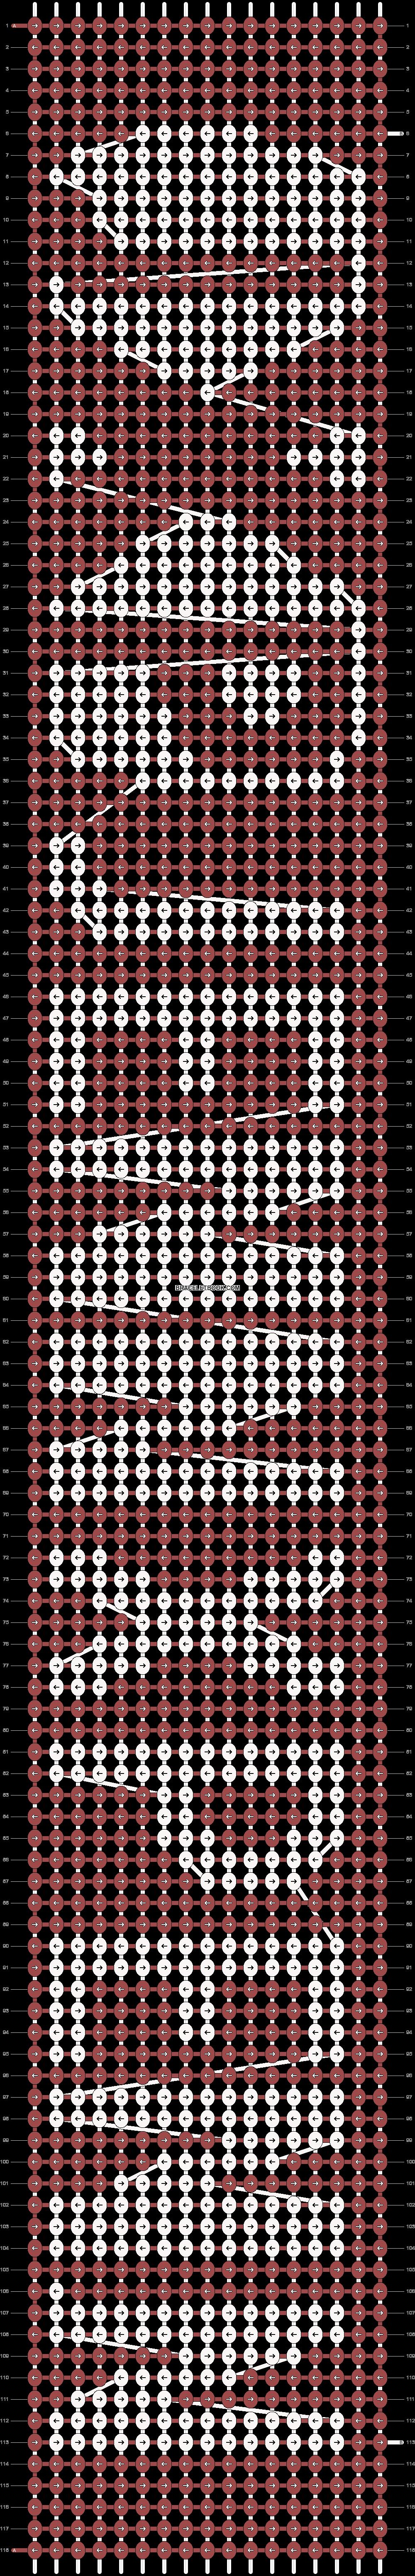 Alpha pattern #13698 pattern